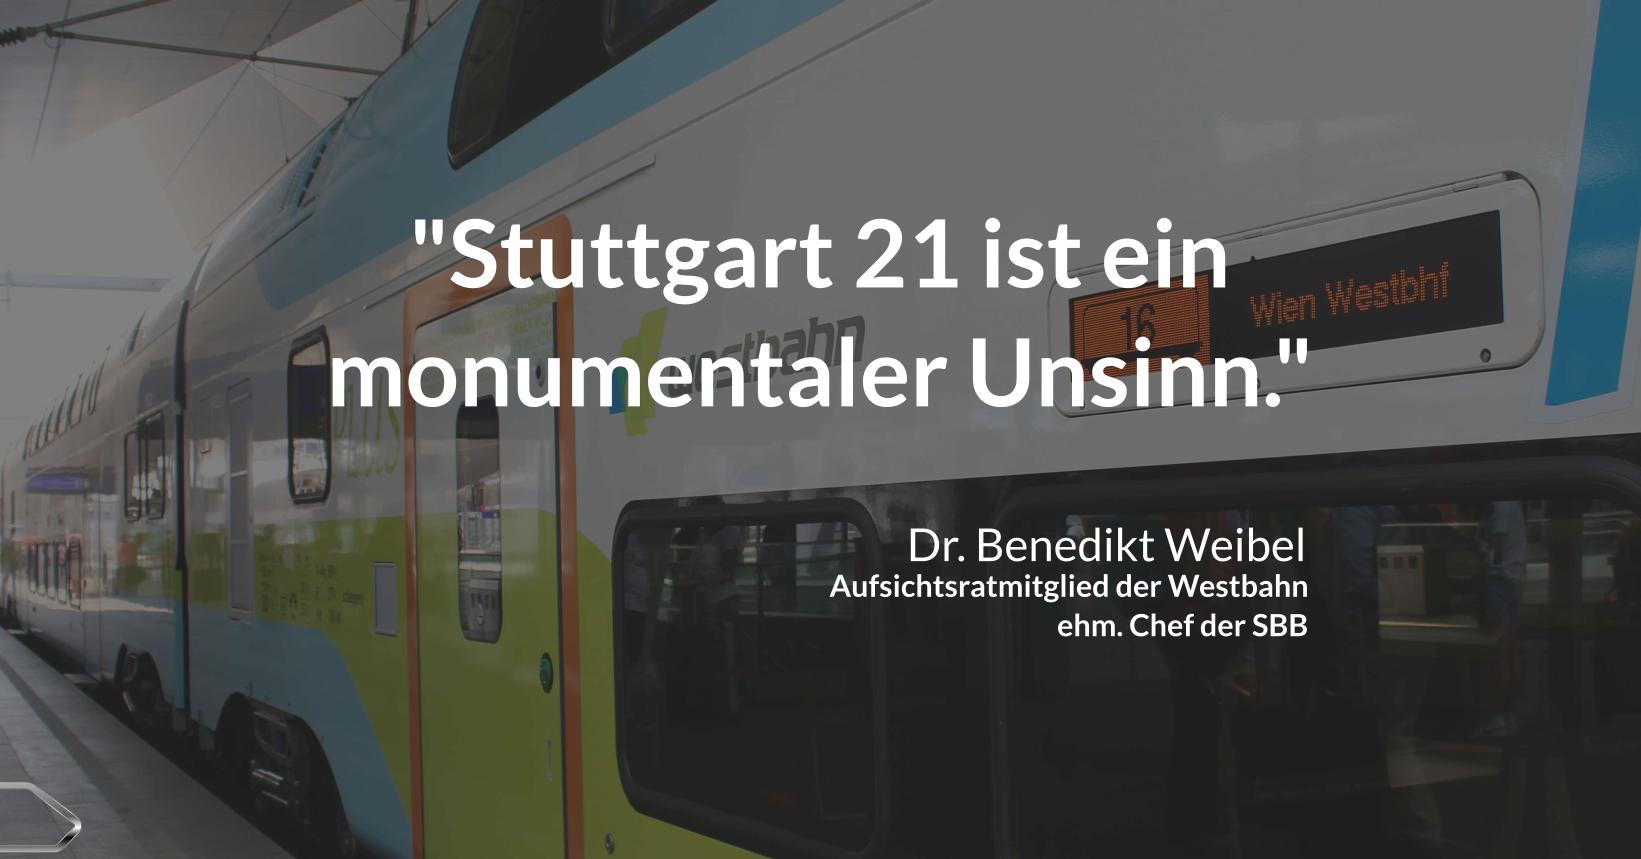 Stuttgart 21 Dr.Weibel